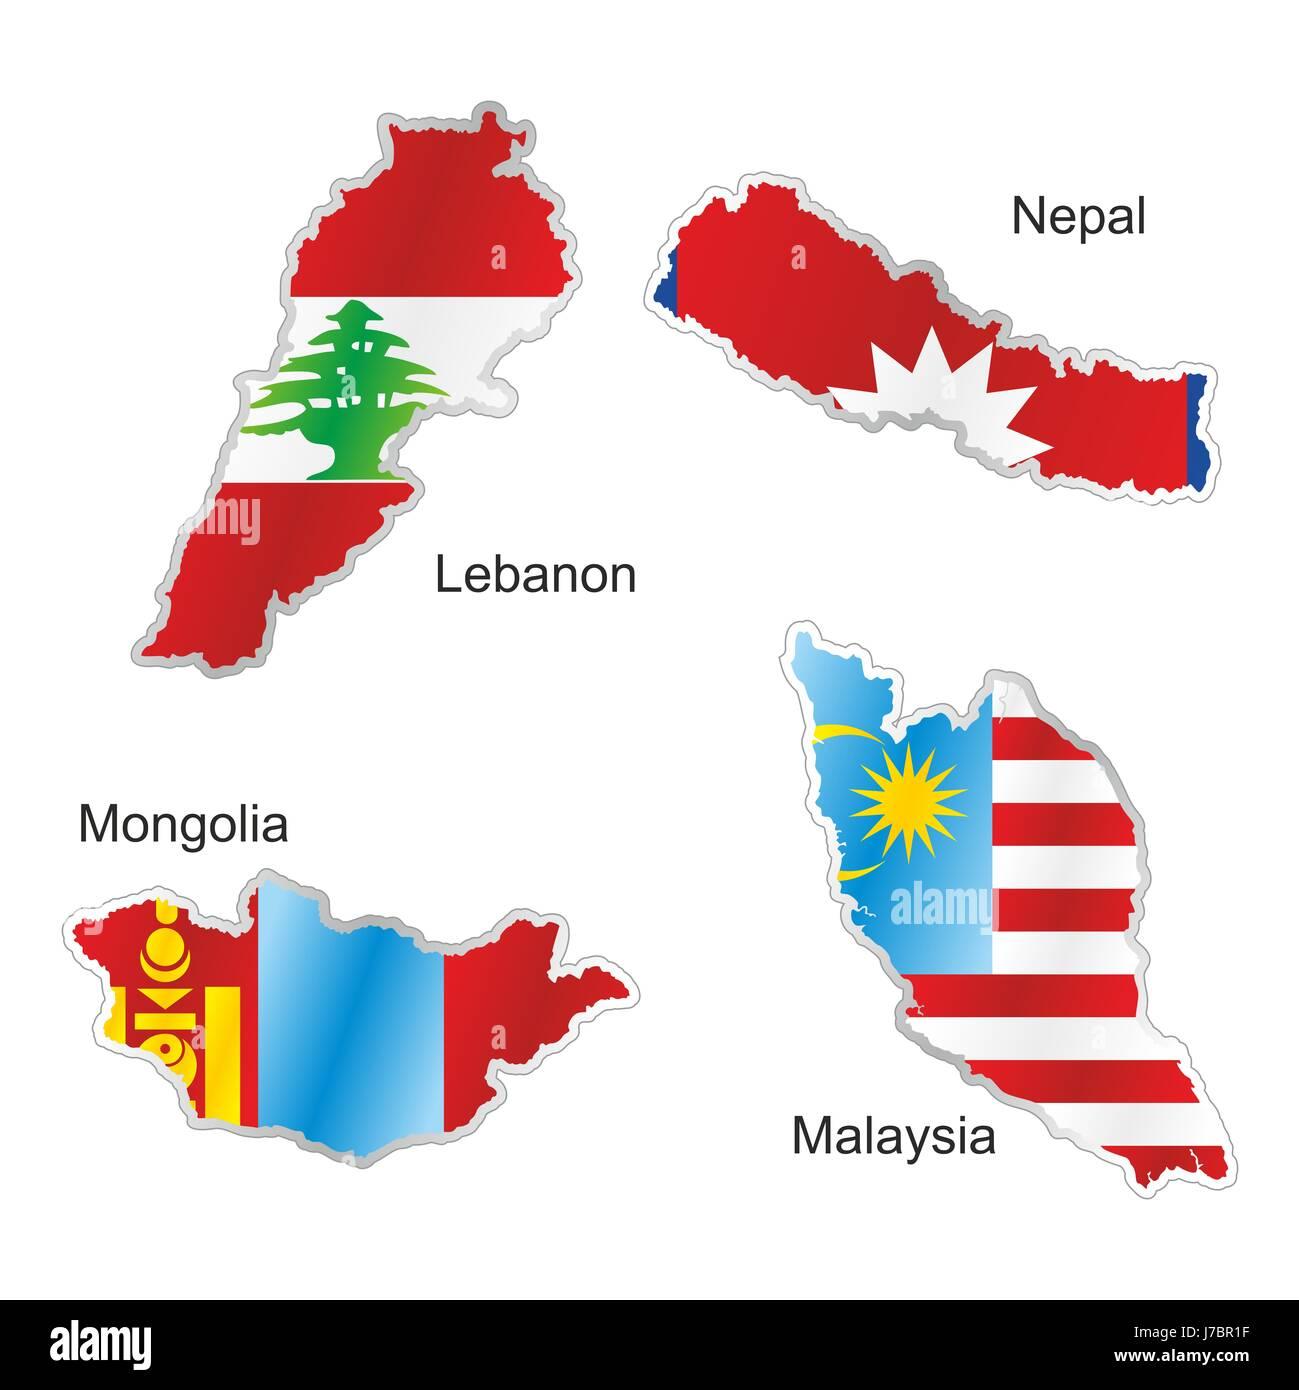 asia mongolia malaysia flag nepal lebanon map atlas map of the world ...